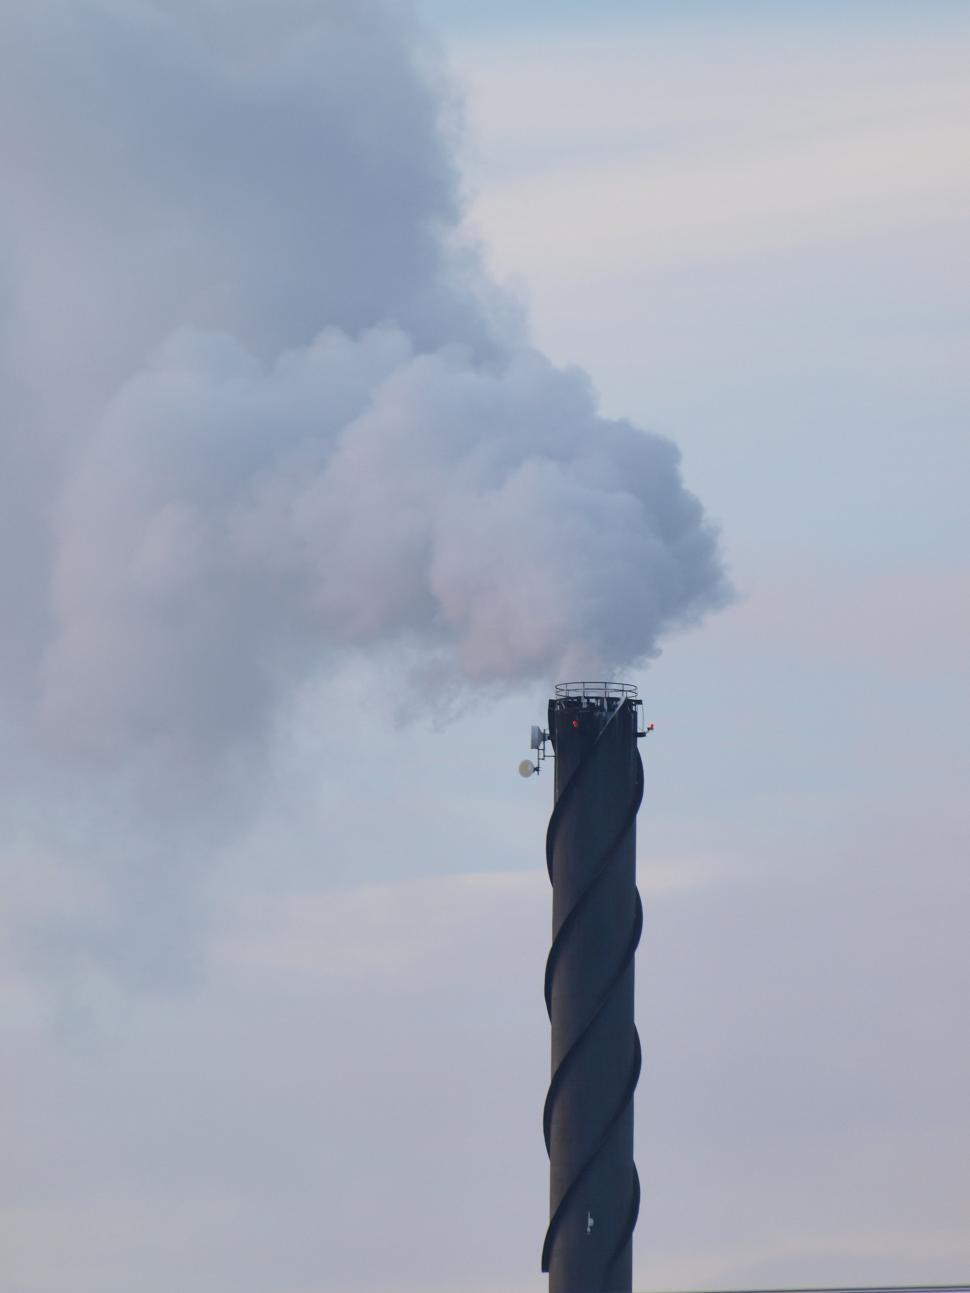 Download Free Stock HD Photo of Big Chimney Spews Smoke Online